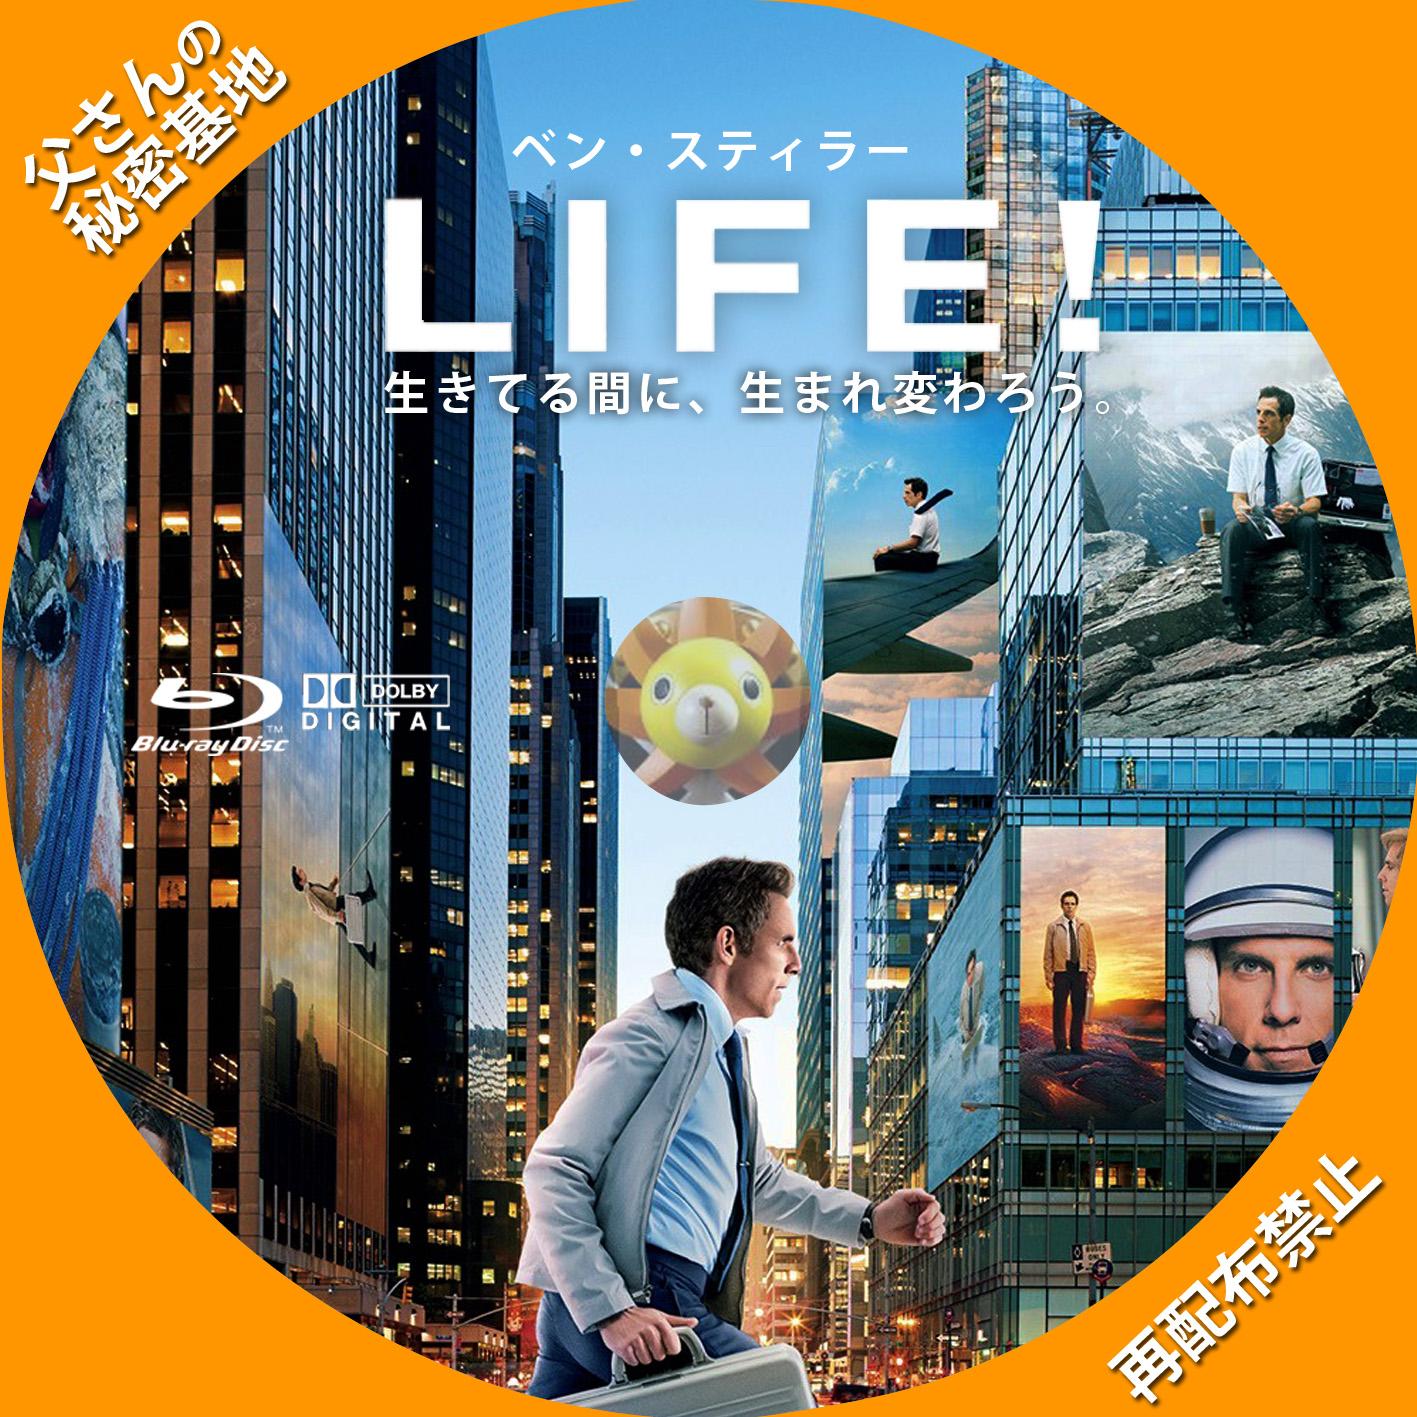 MITTY_LIFE!_BD_A.jpg